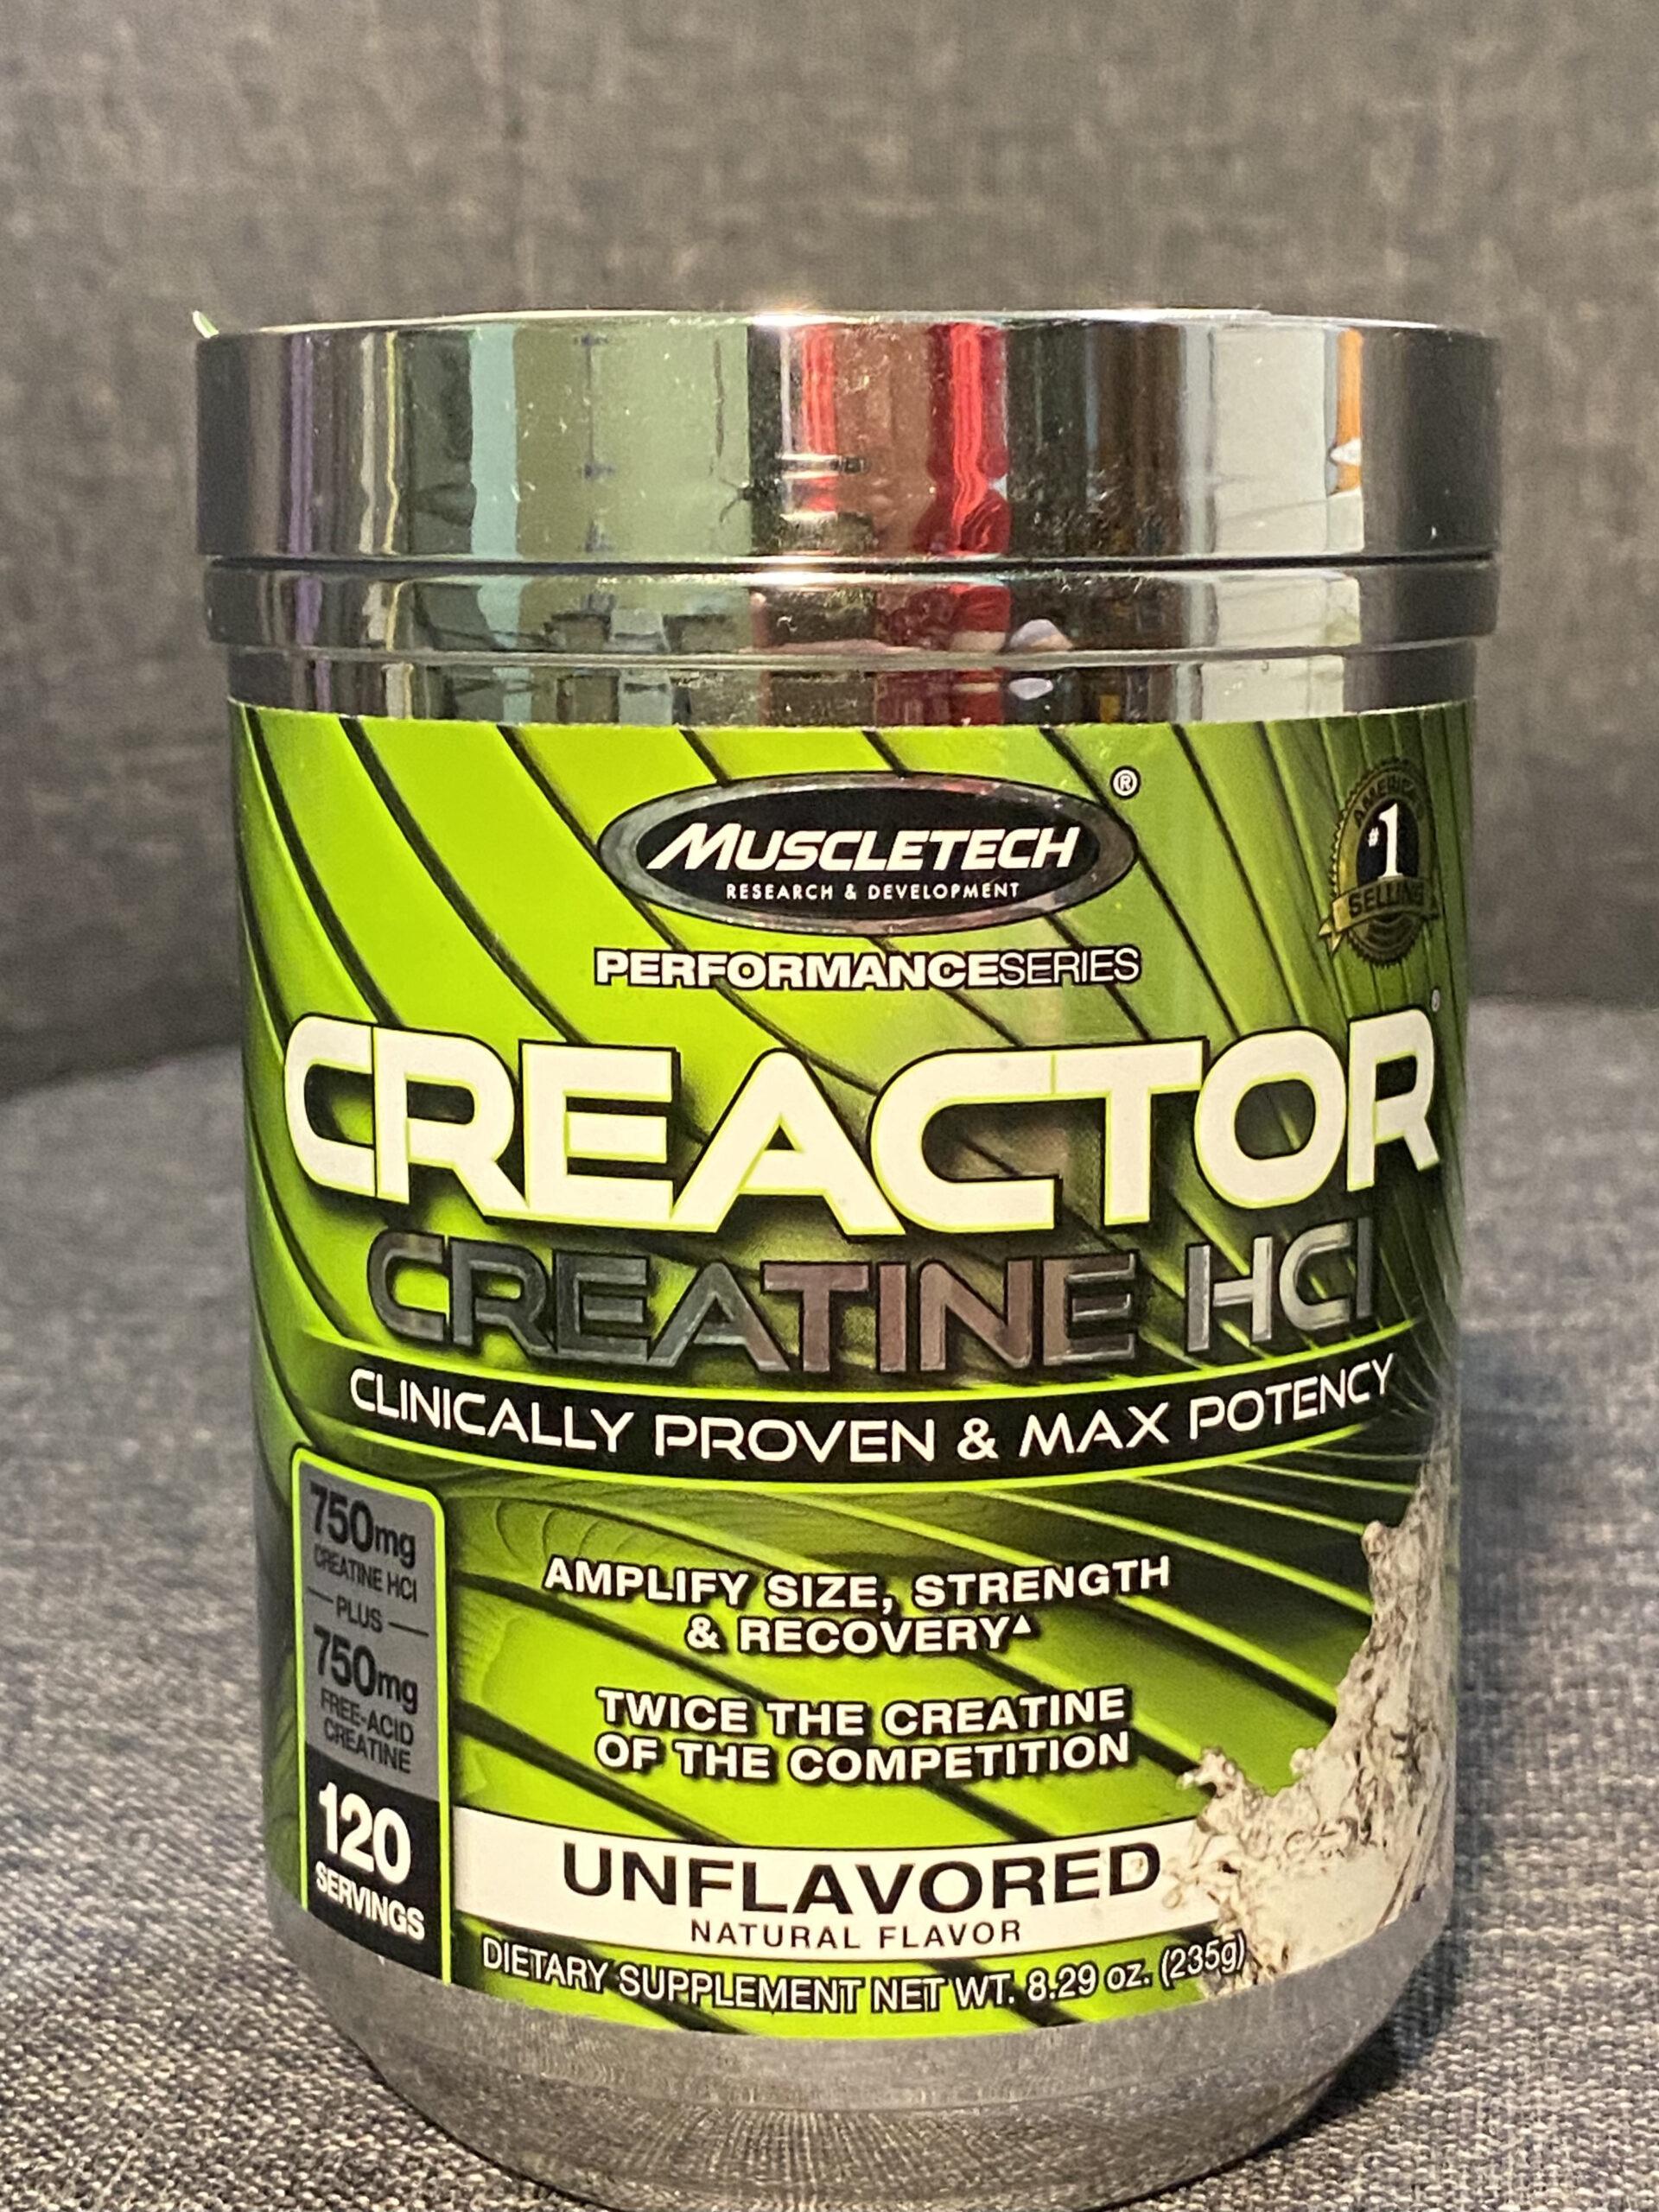 Creactor Creatine Hydrochloride